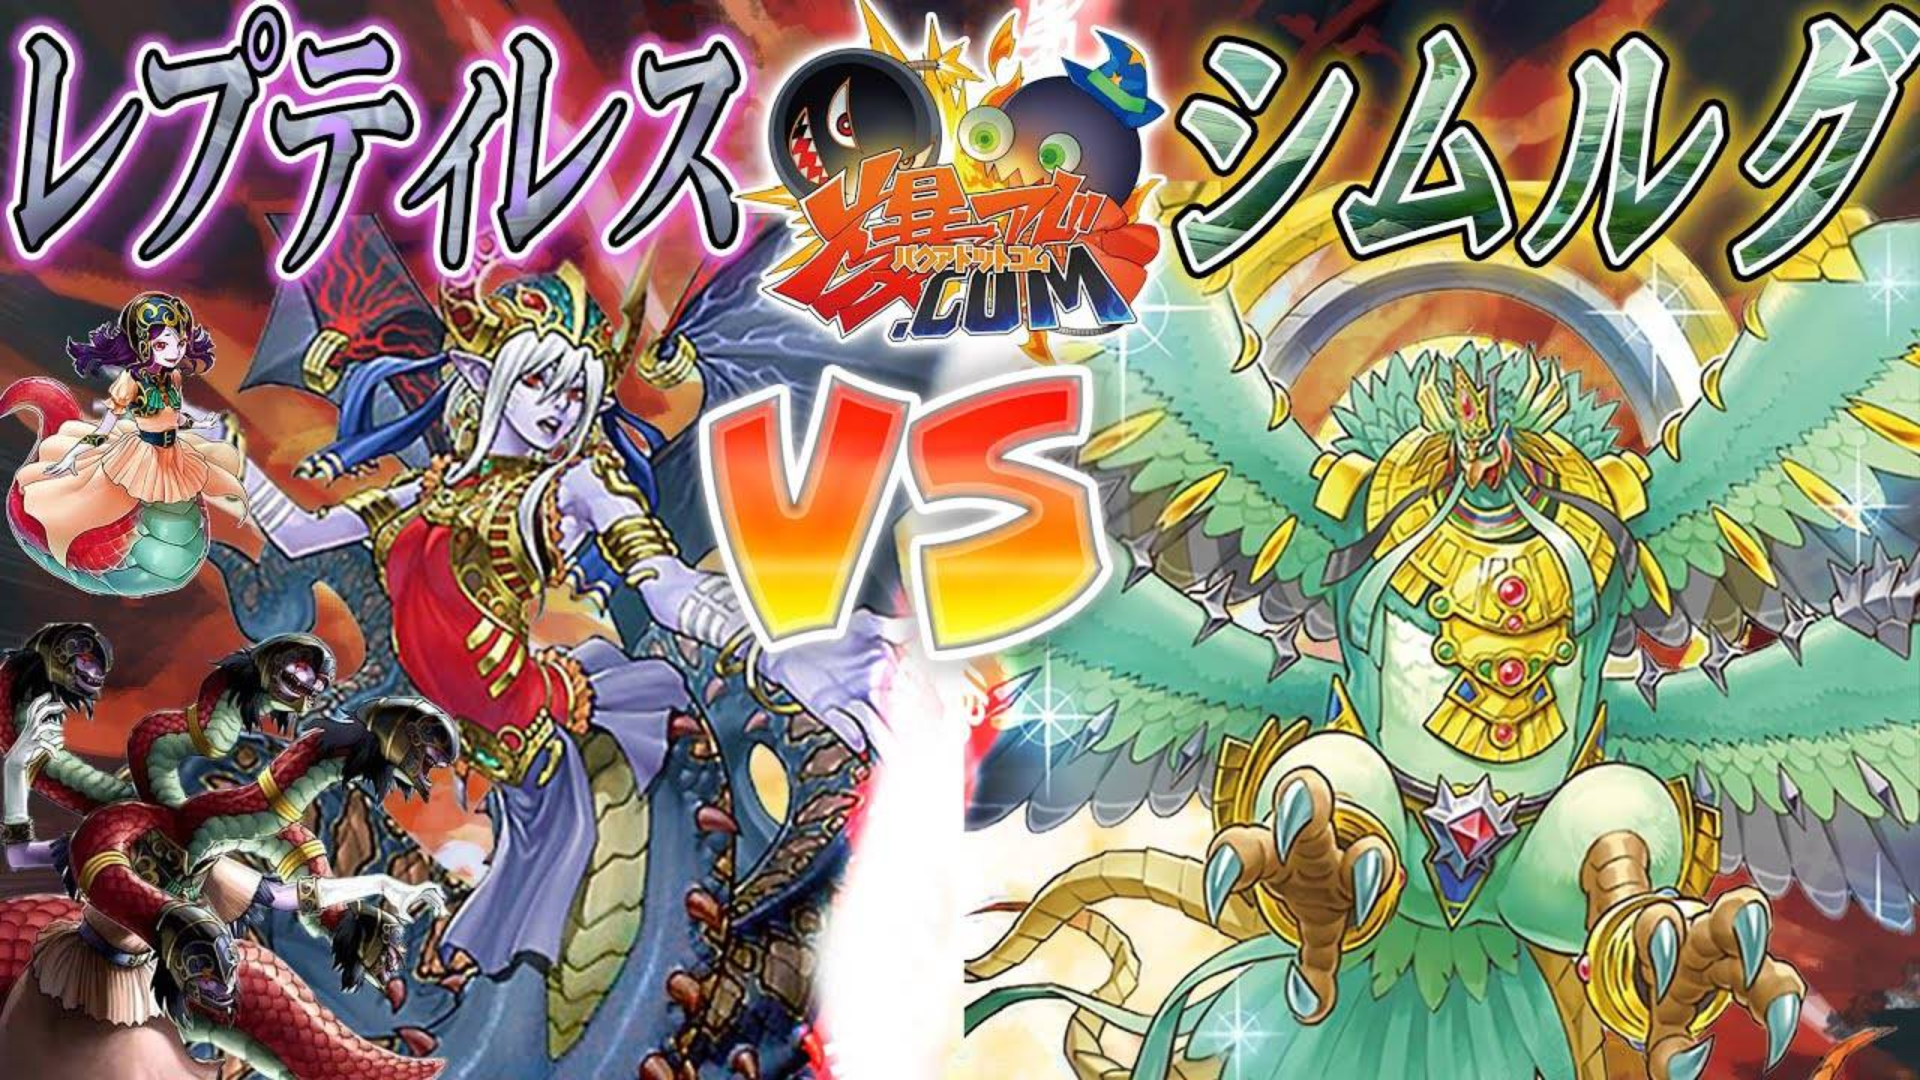 [OCG⑨课字幕组] 最强生物决定战 『爬虫妖女』 vs 『斯摩夫』